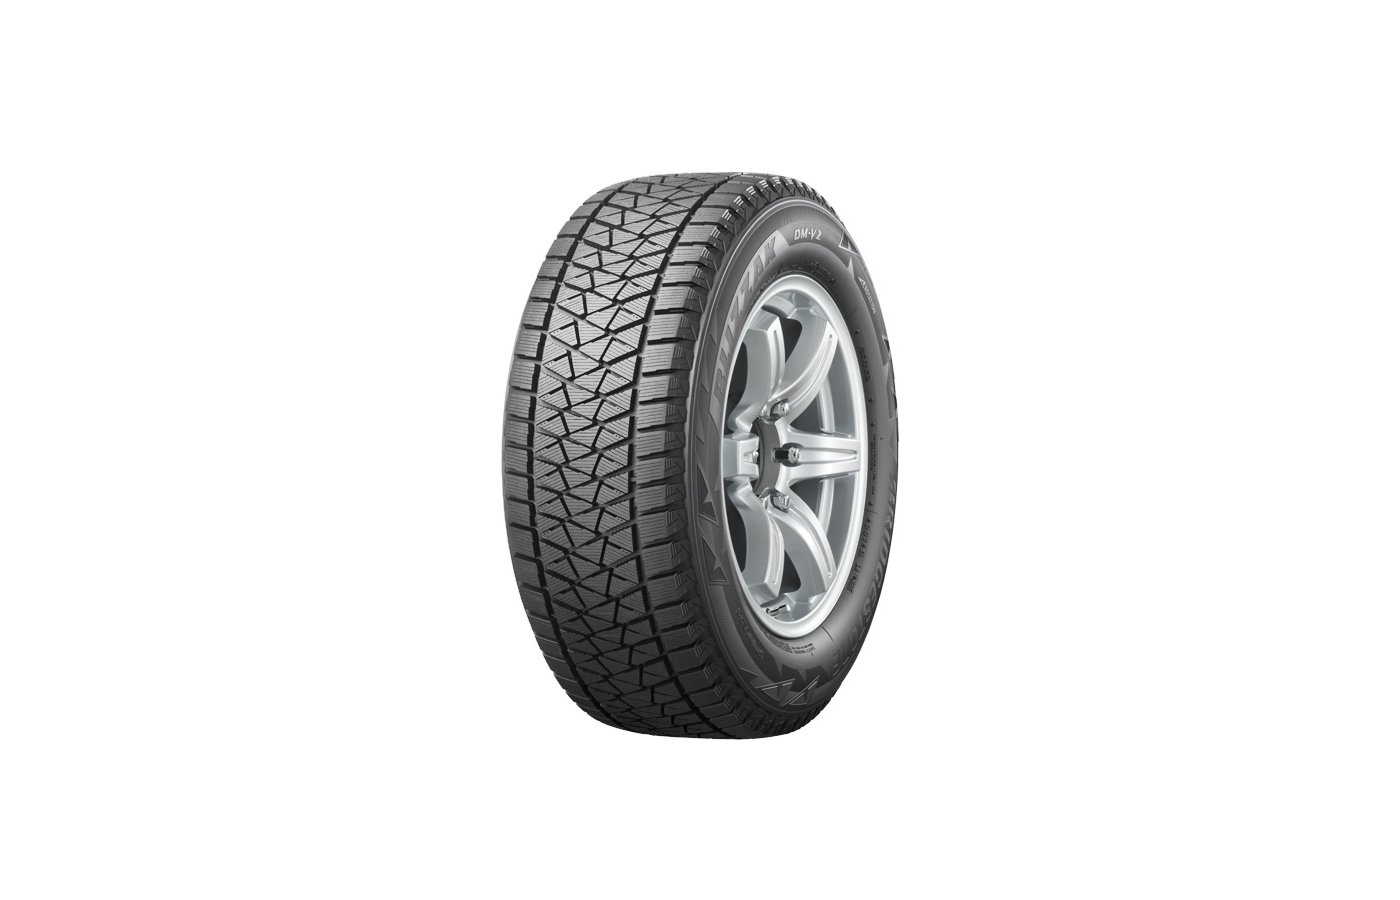 Шина Bridgestone Blizzak DM-V2 225/70 R16 TL 103S